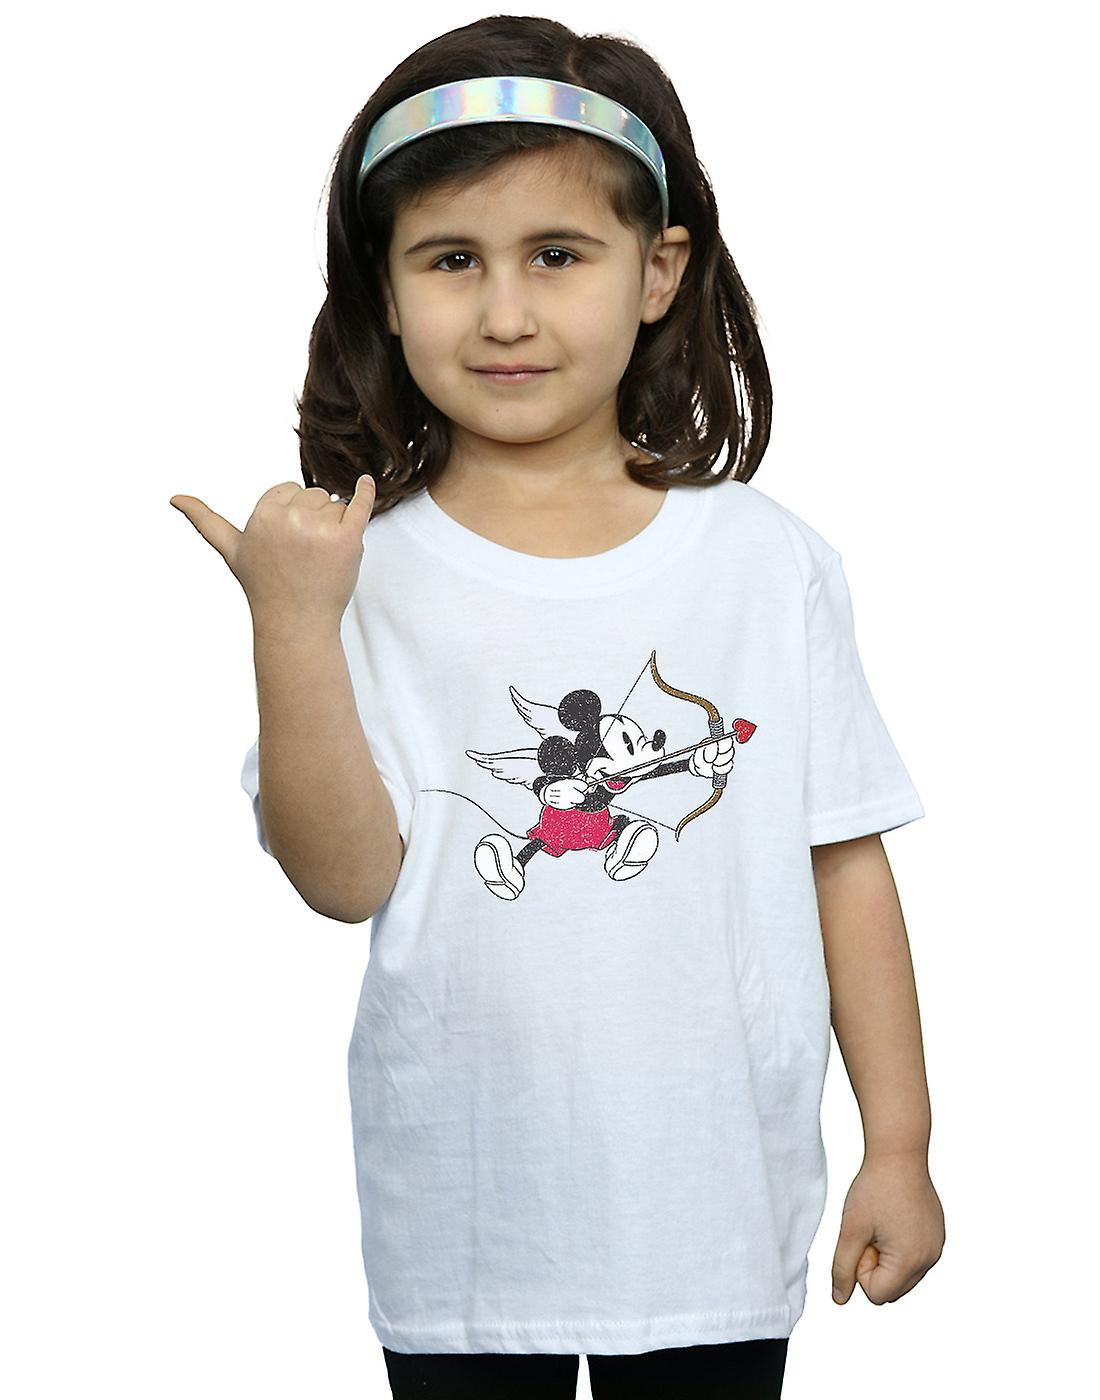 Disney Girls Mickey Mouse Love Cherub T-Shirt